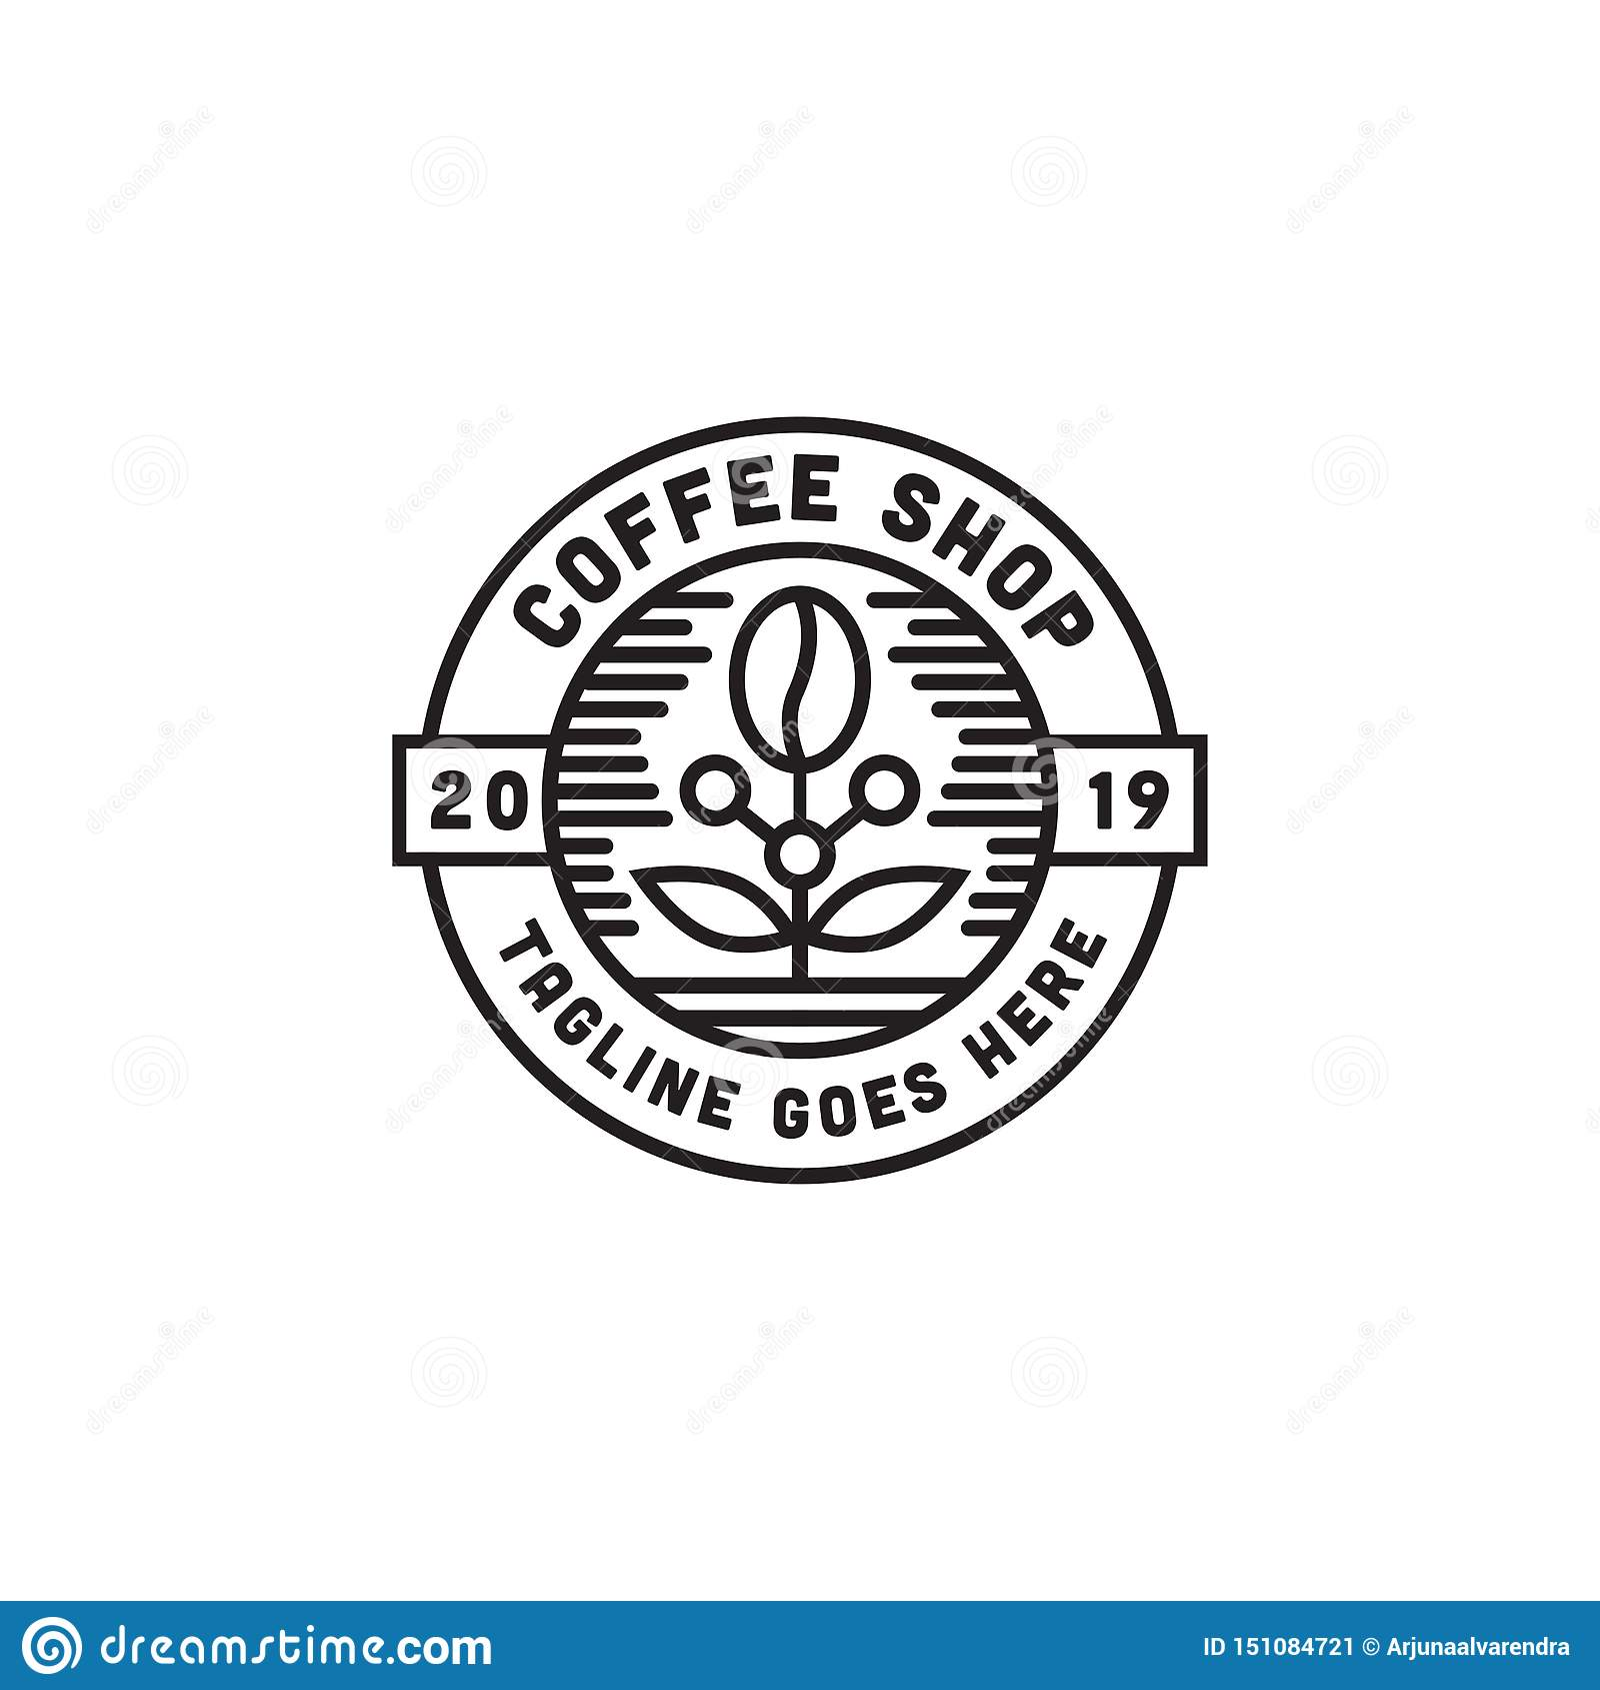 Coffee Shop Logo Design Inspiration With Line Art Vector Stock Illustration Illustration Of Concept Espresso 151084721